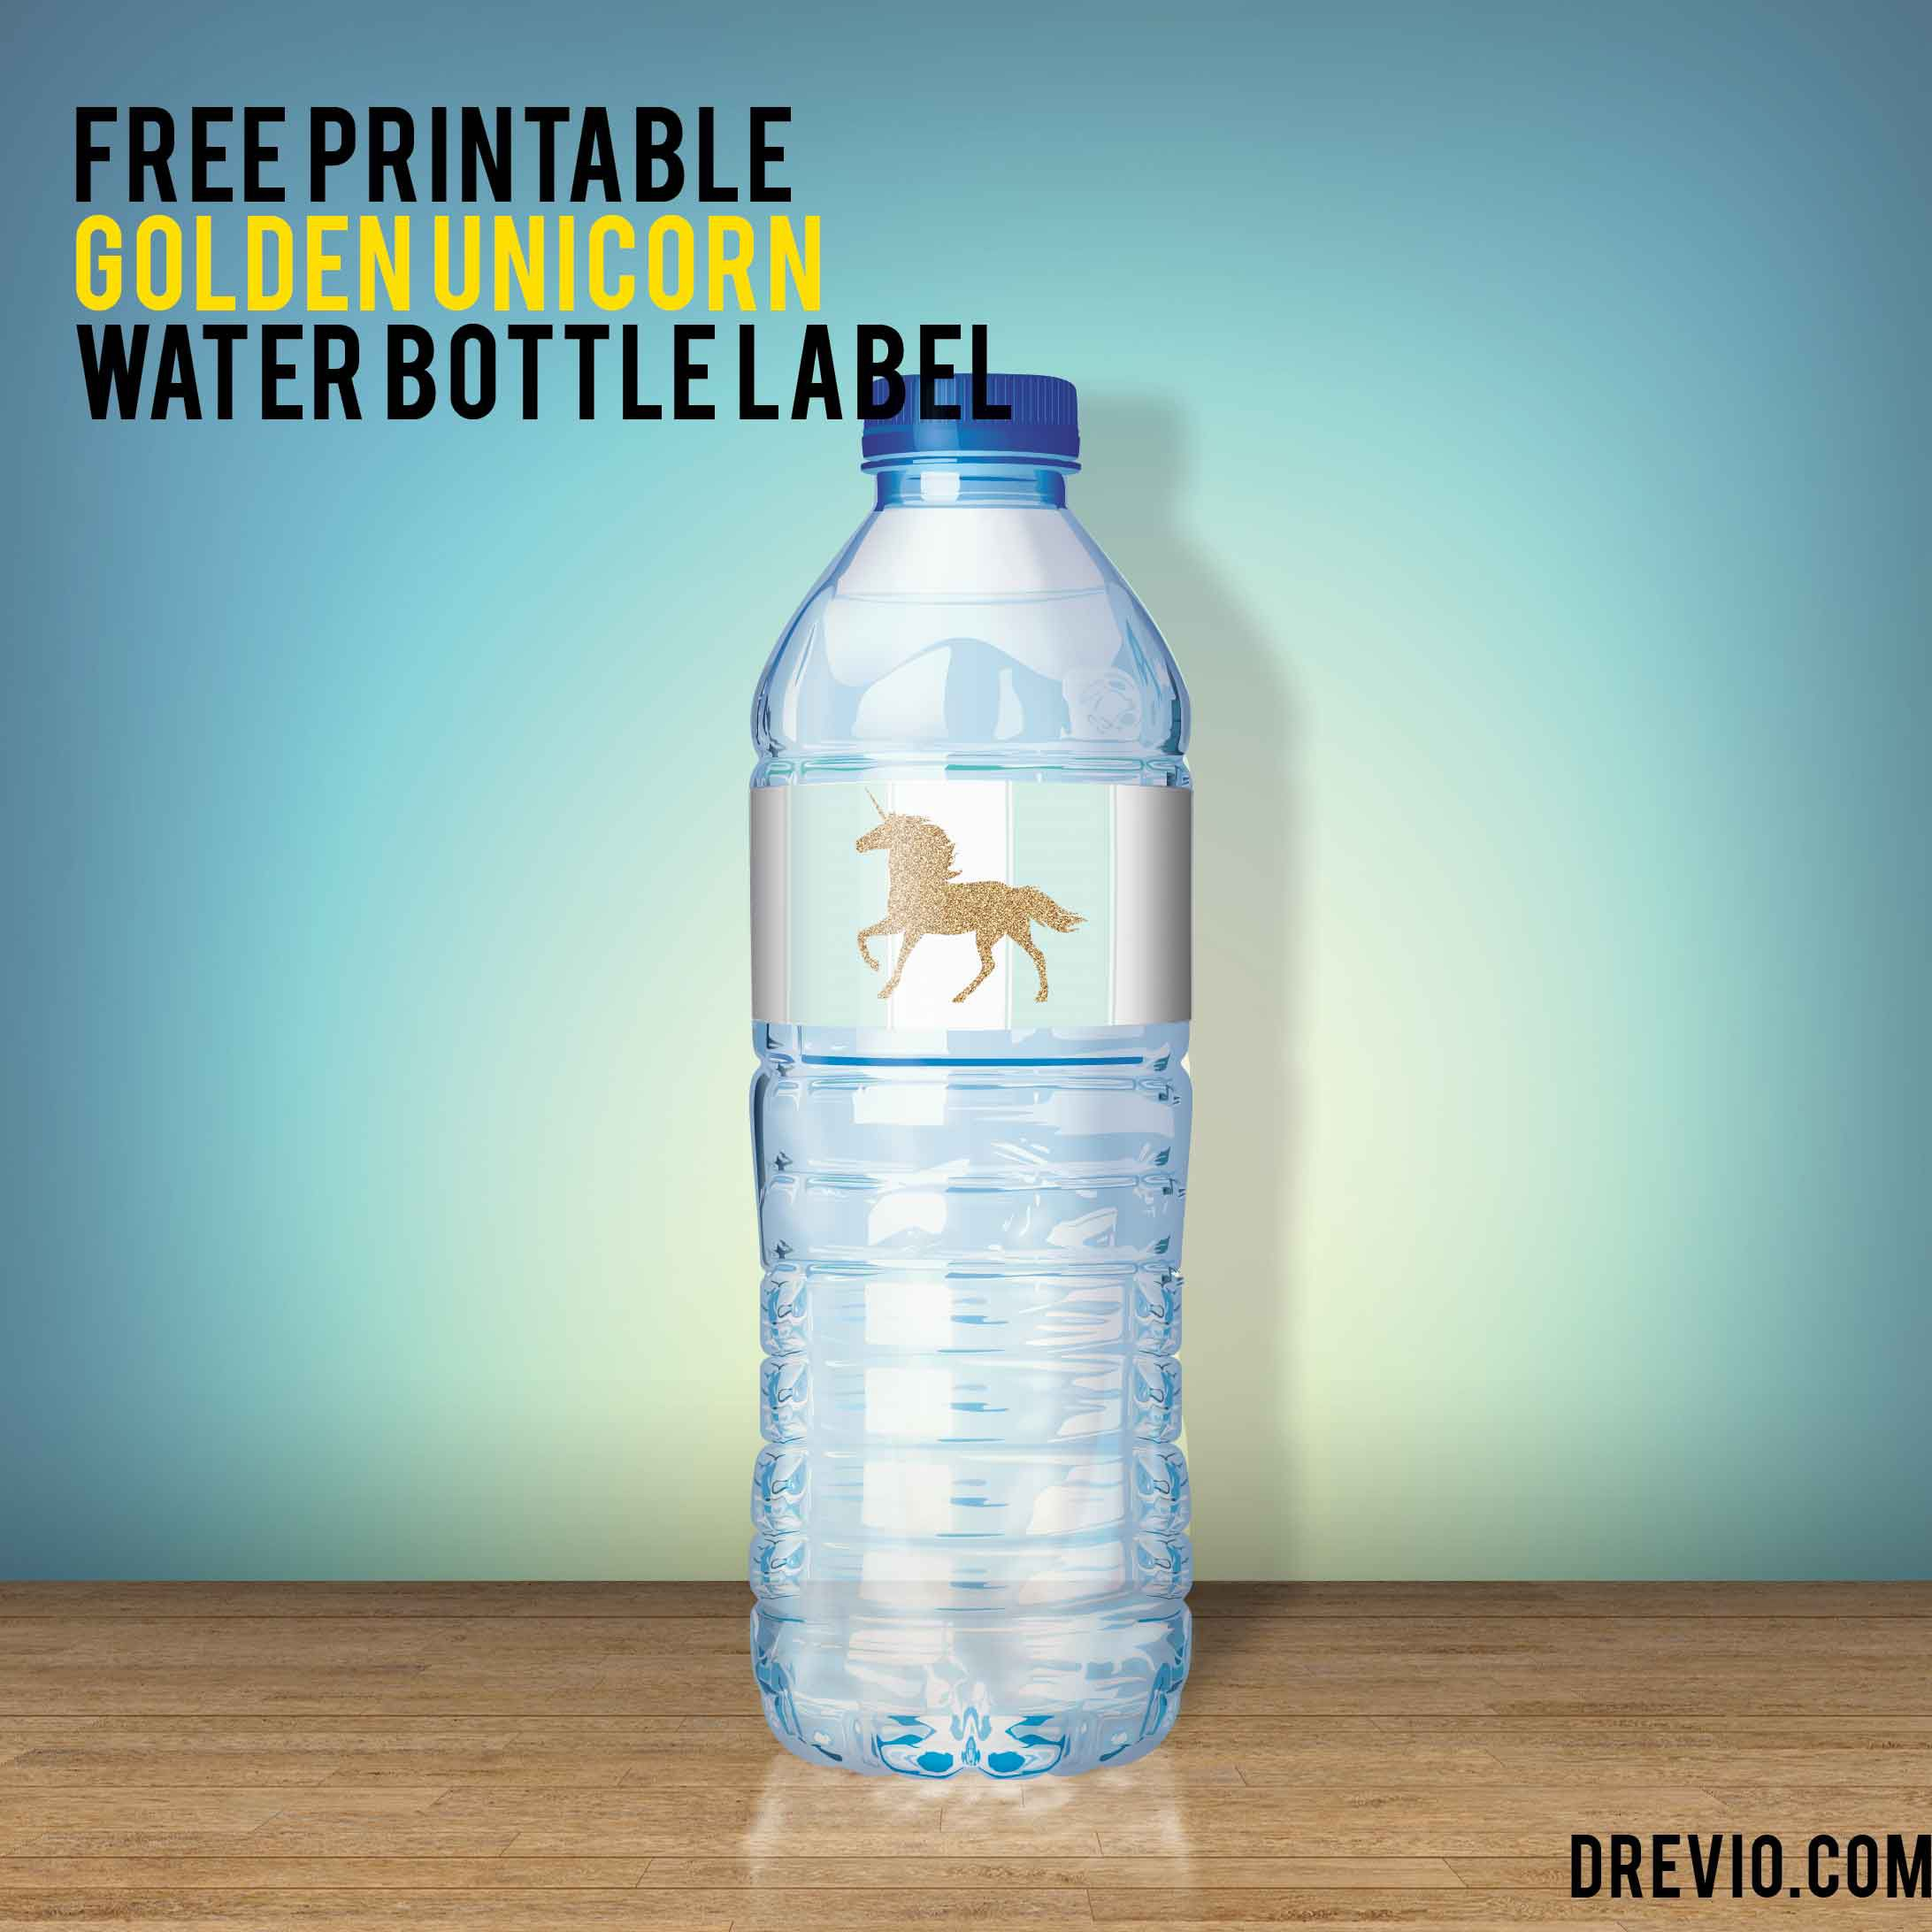 004 Frightening Water Bottle Label Template Free Photo  Word Superhero PhotoshopFull